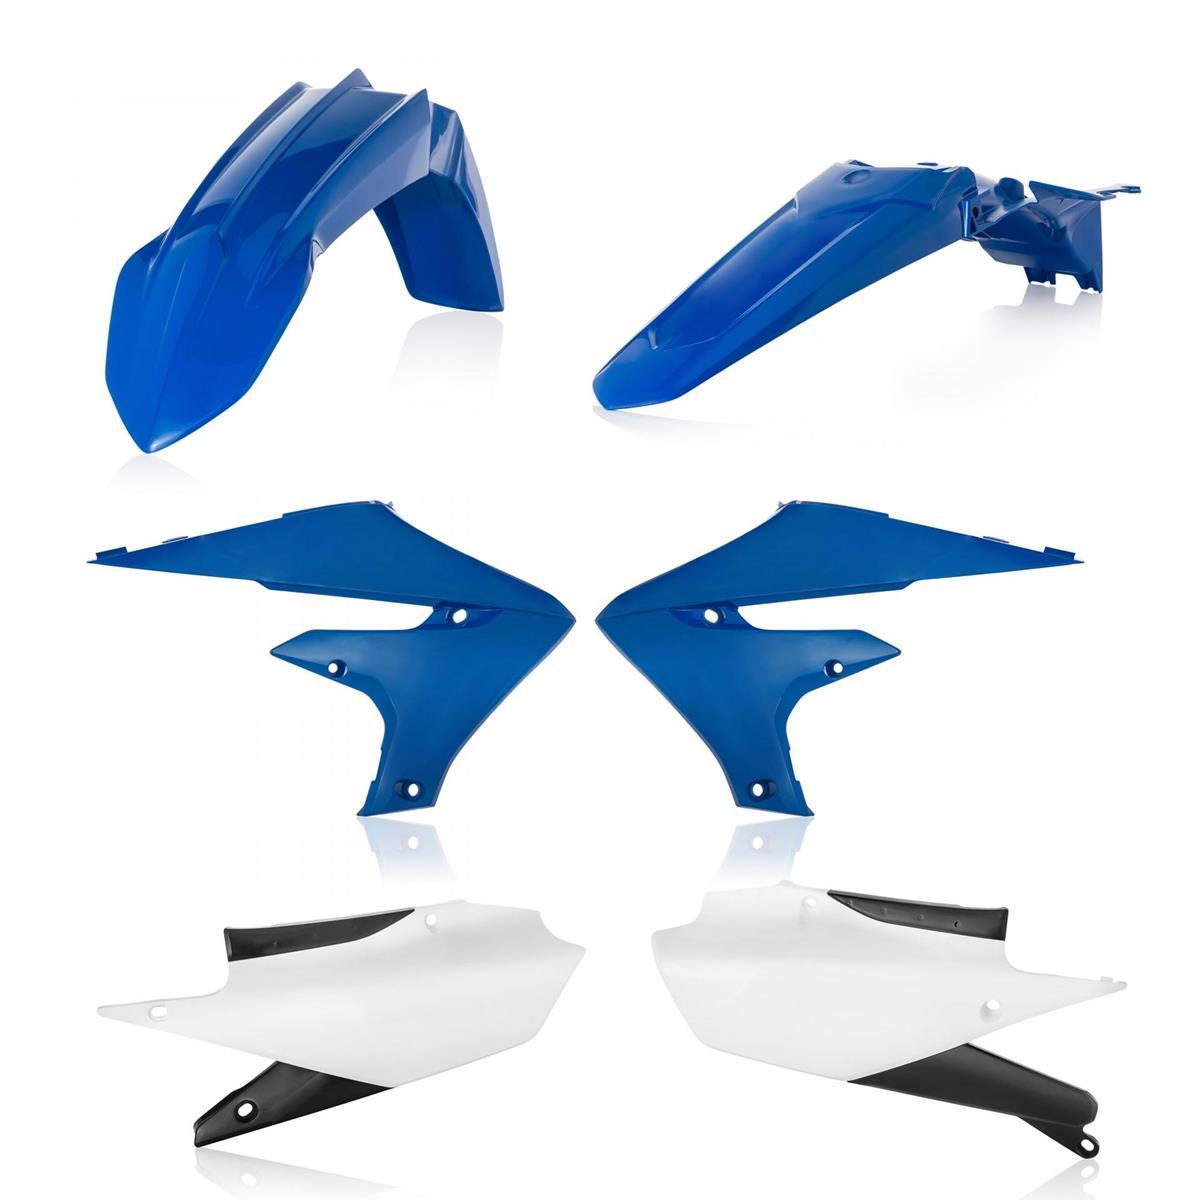 Acerbis Plastik-Kit  Yamaha YZF 450 2019, Blau/Weiß Original